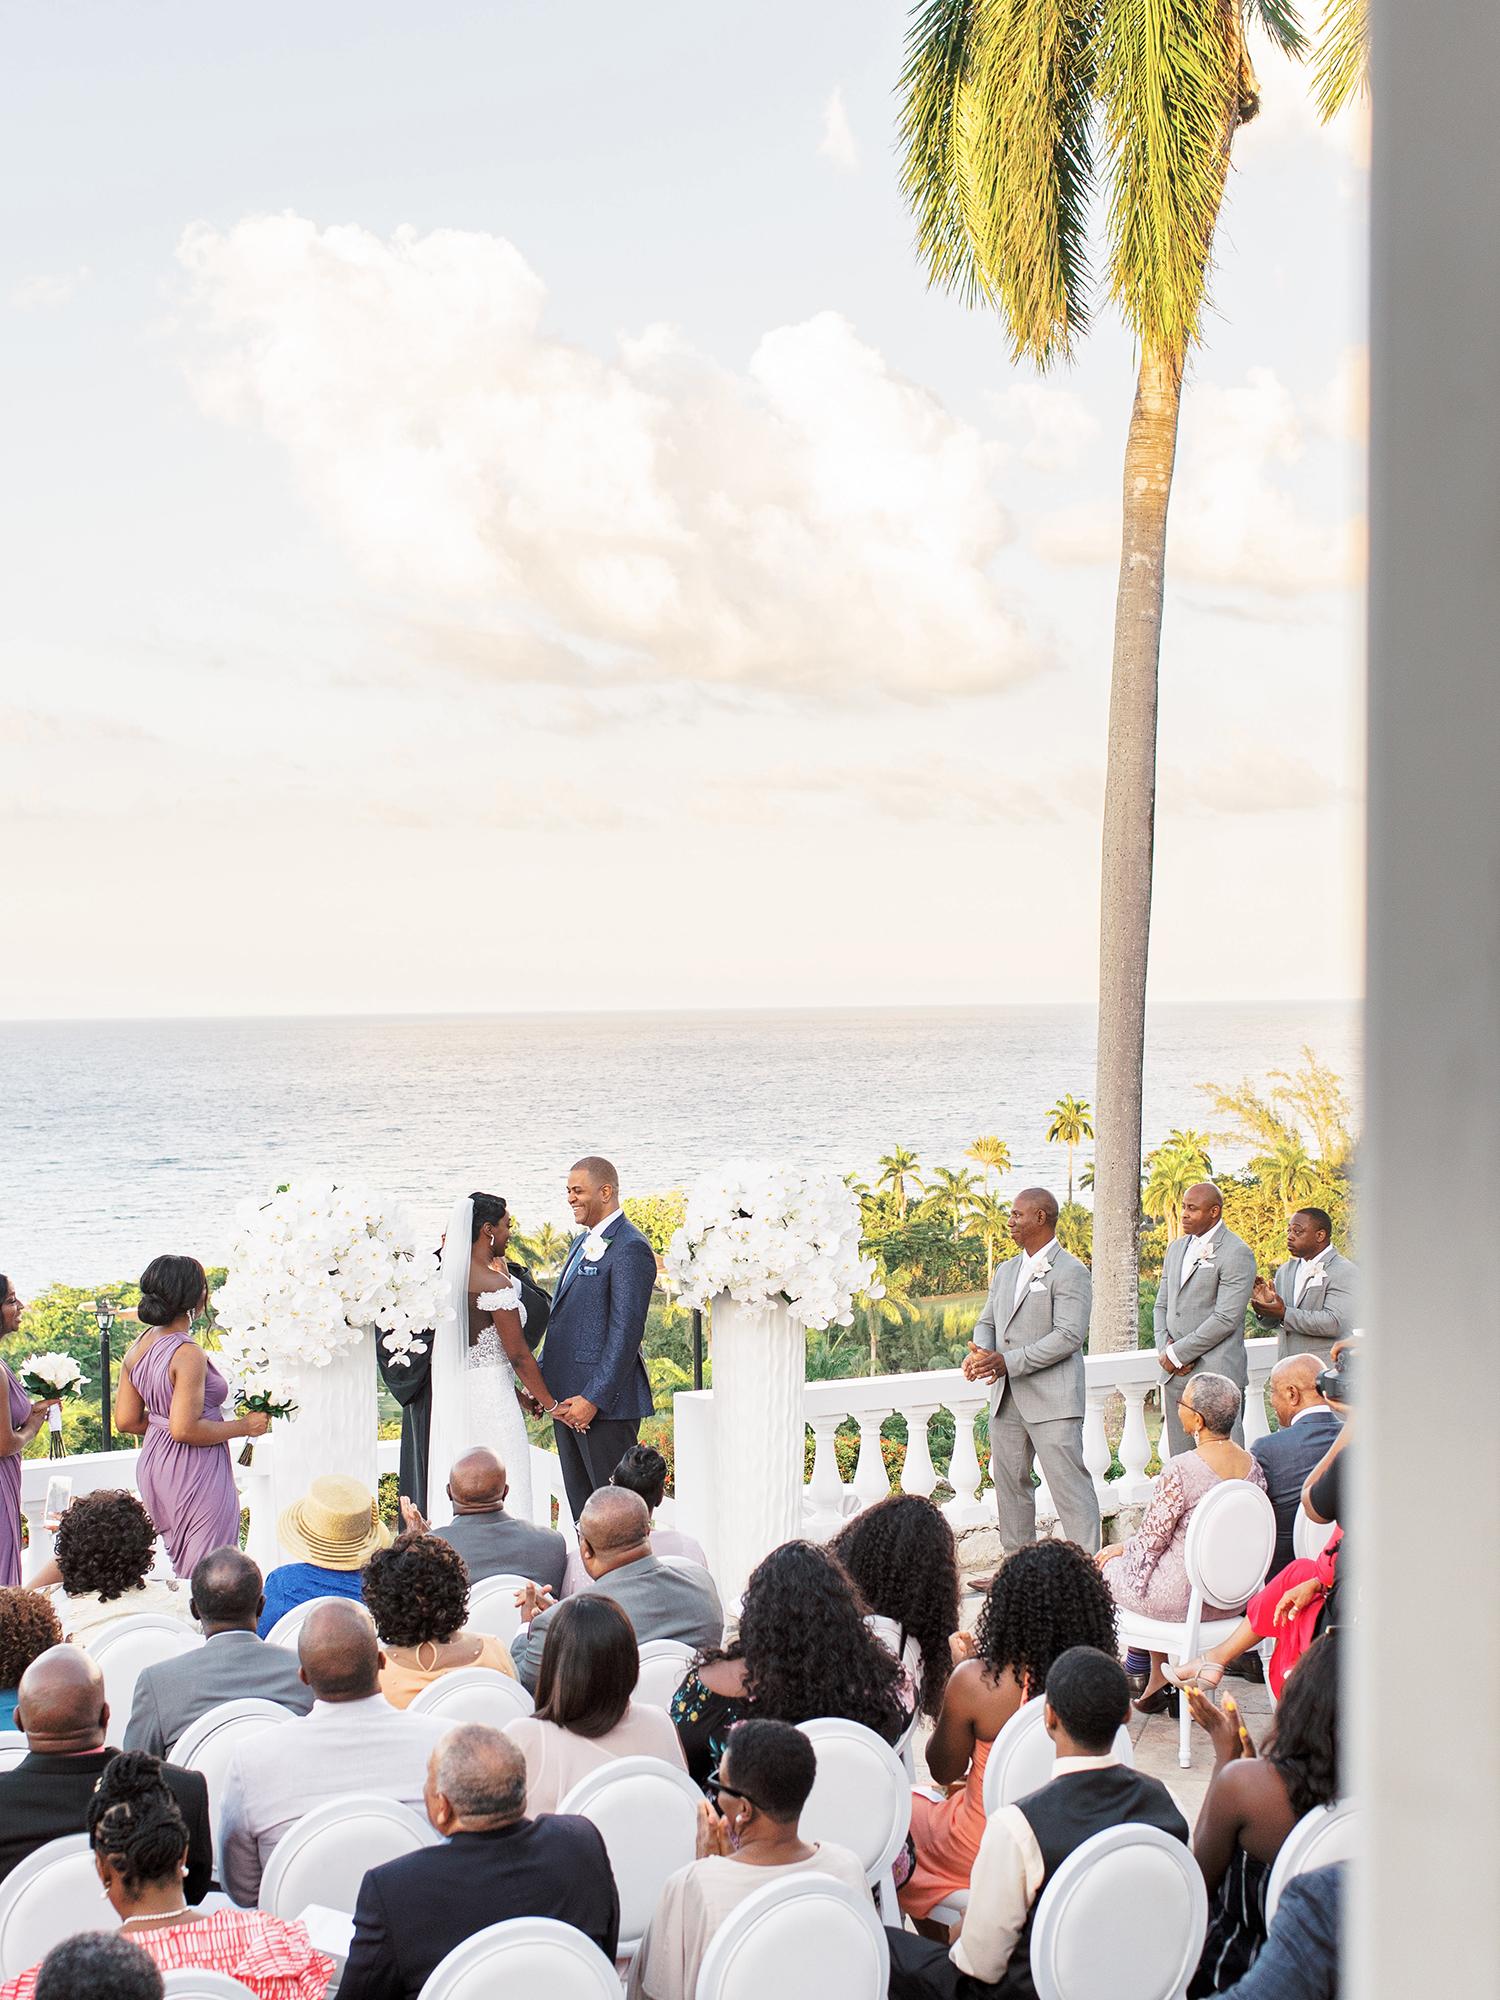 melissa leighton wedding ceremony overlooking water